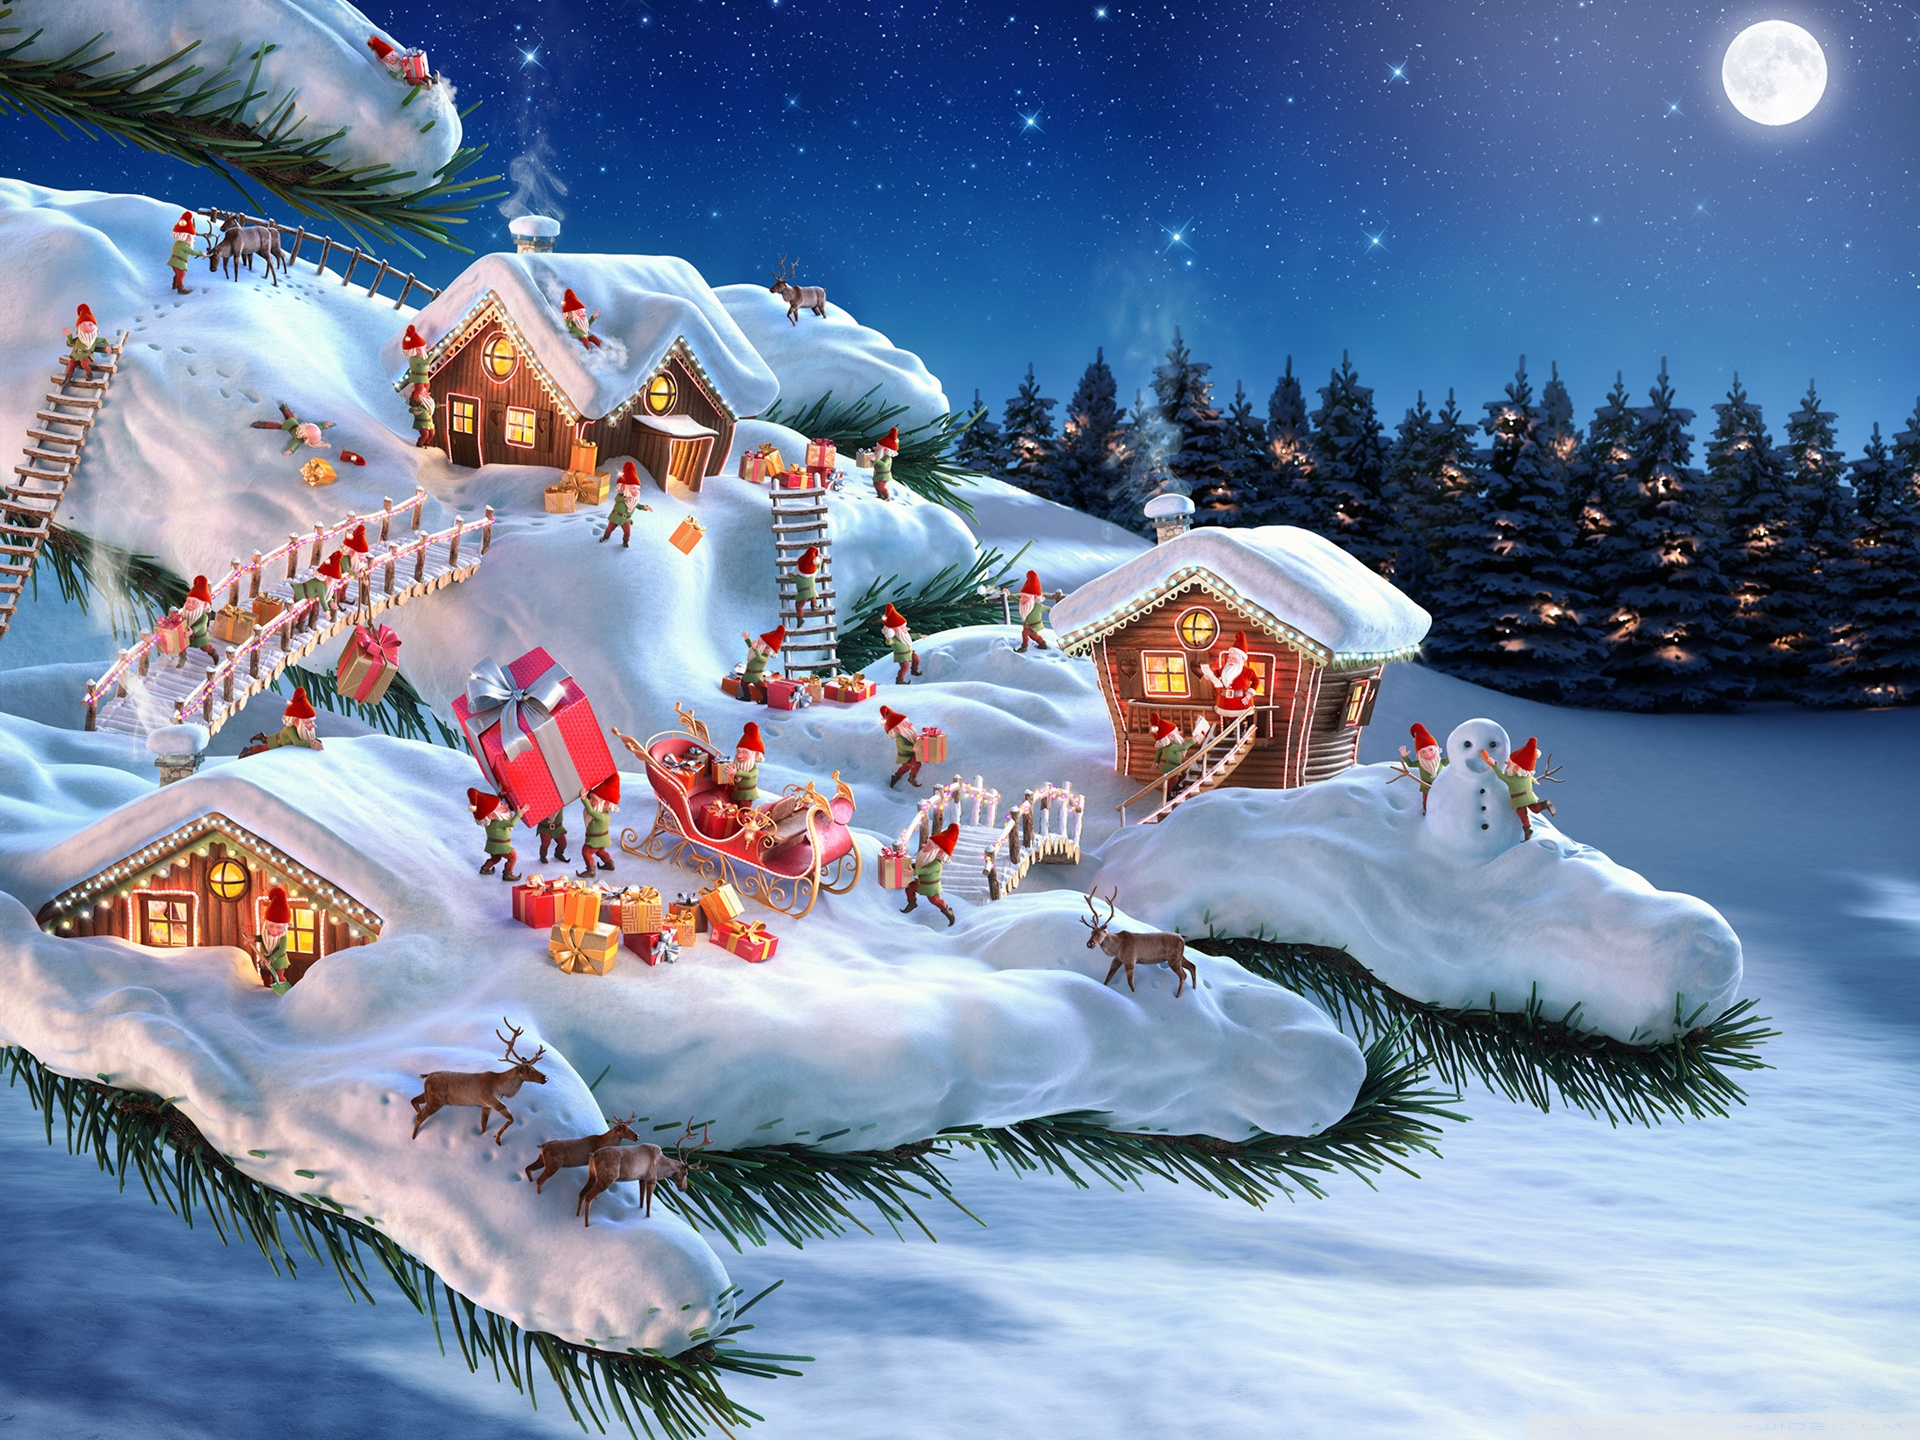 Santa and his Elves 4K HD Desktop Wallpaper for 4K Ultra HD TV 1920x1440